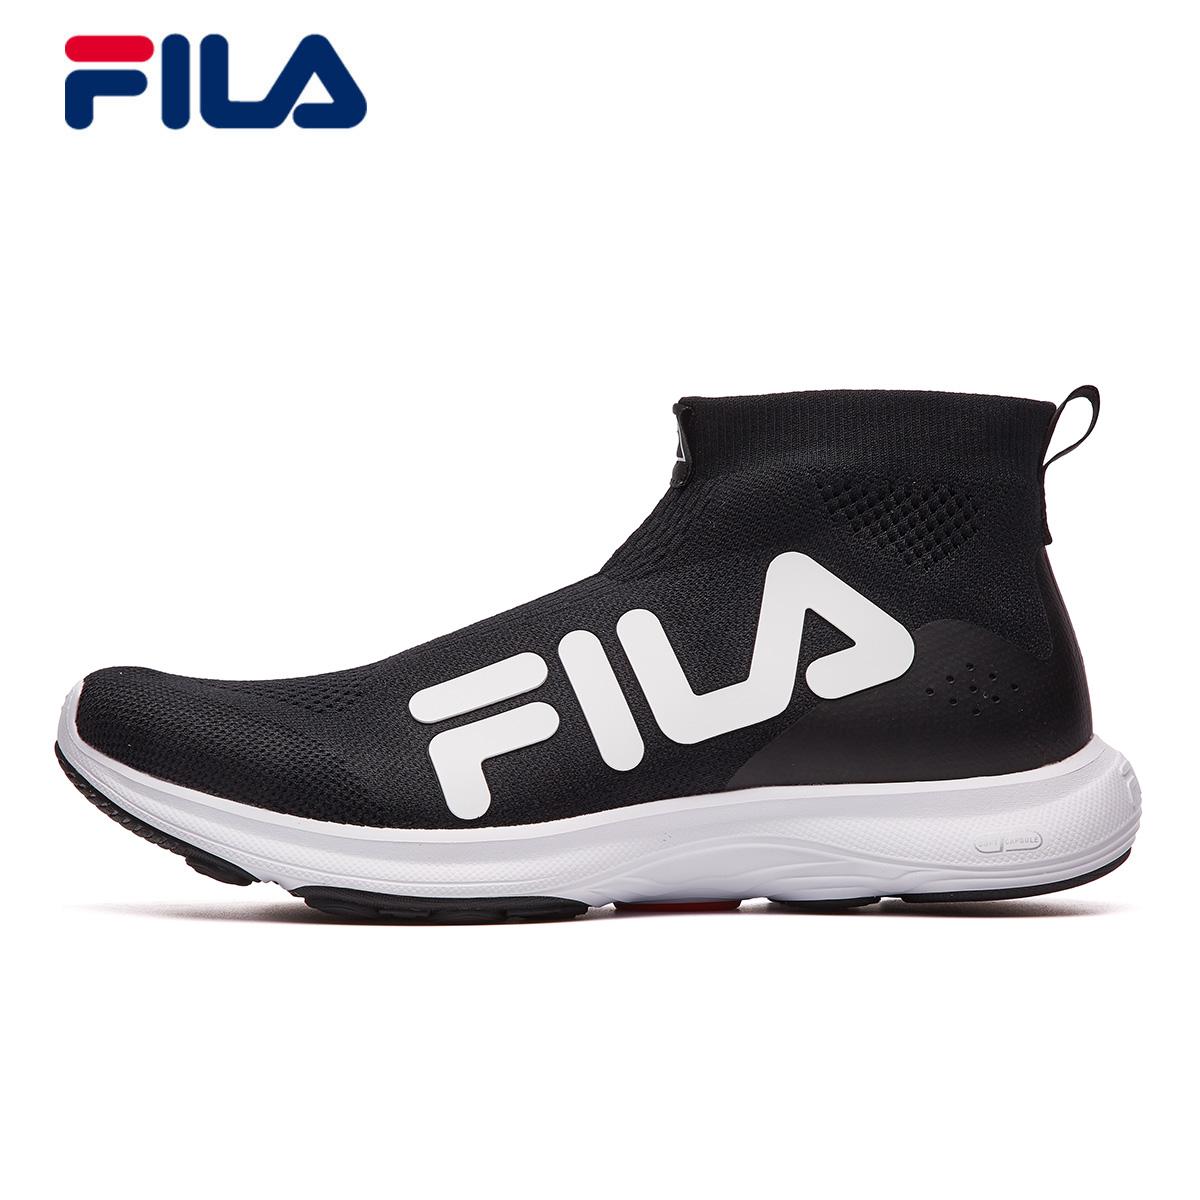 FILA斐乐女跑鞋2018秋季新款轻质舒适缓震耐磨复古跑鞋